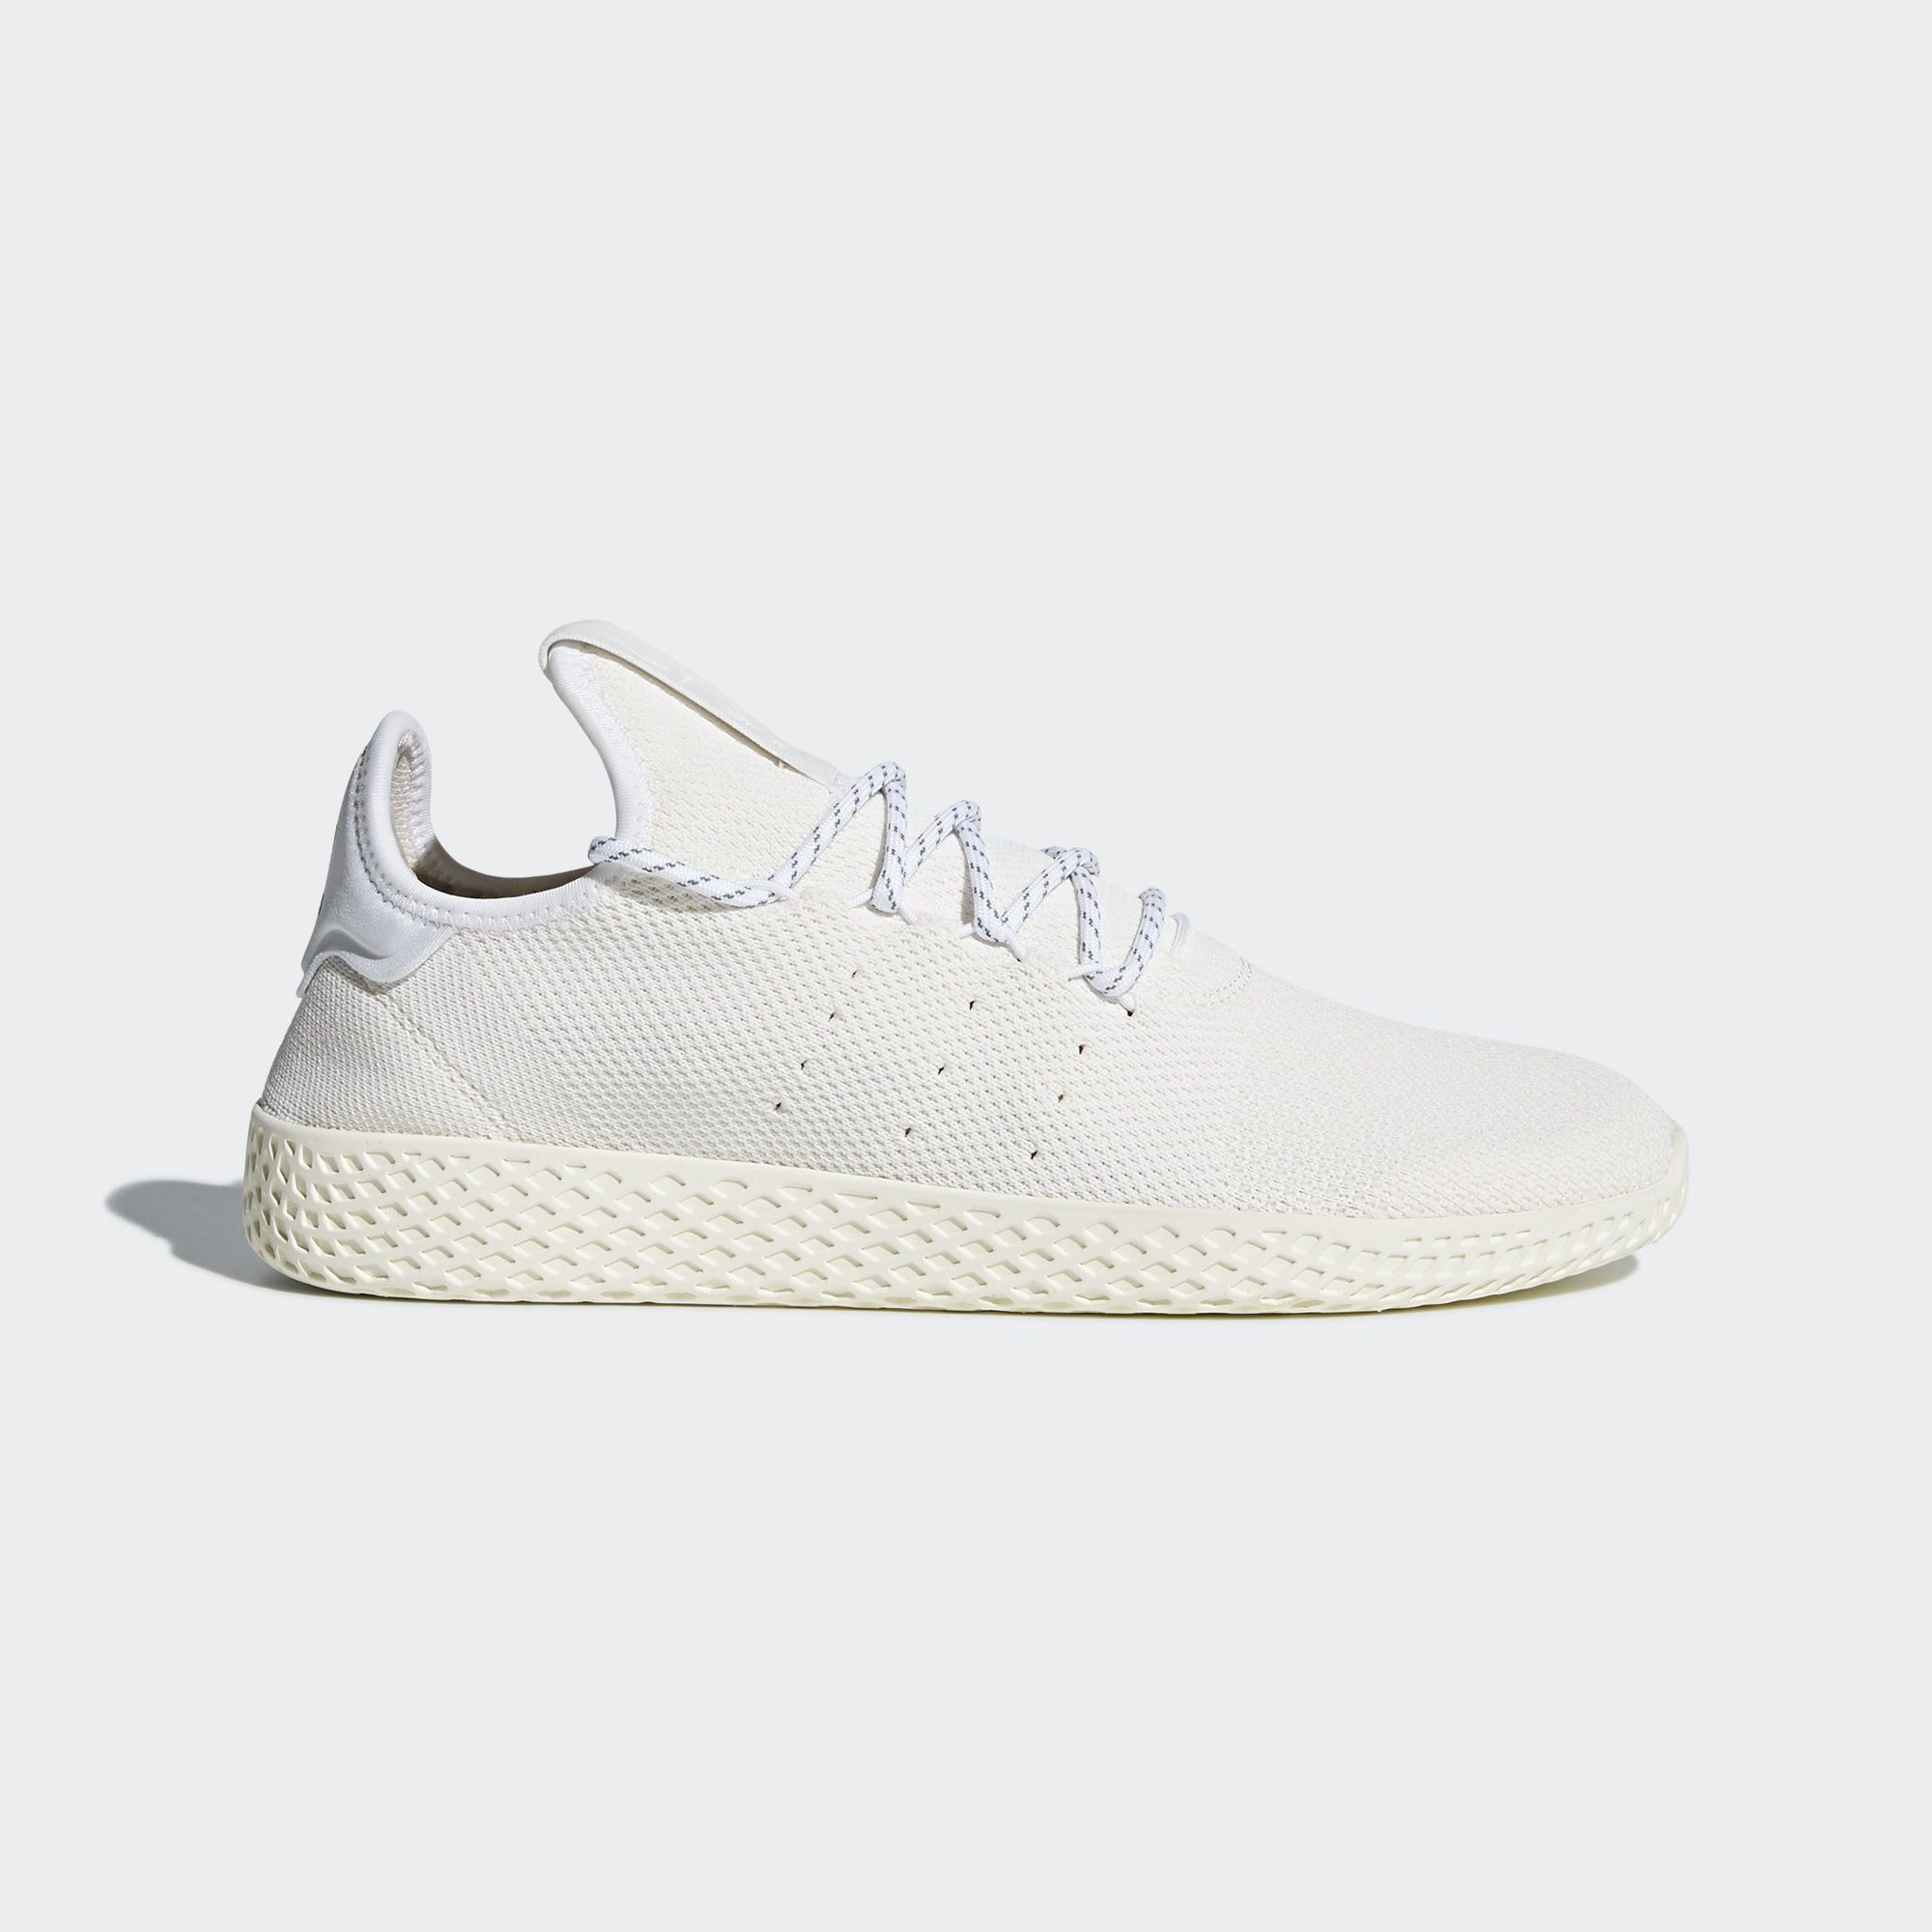 The adidas Originals Hu Collection showcases Pharrell